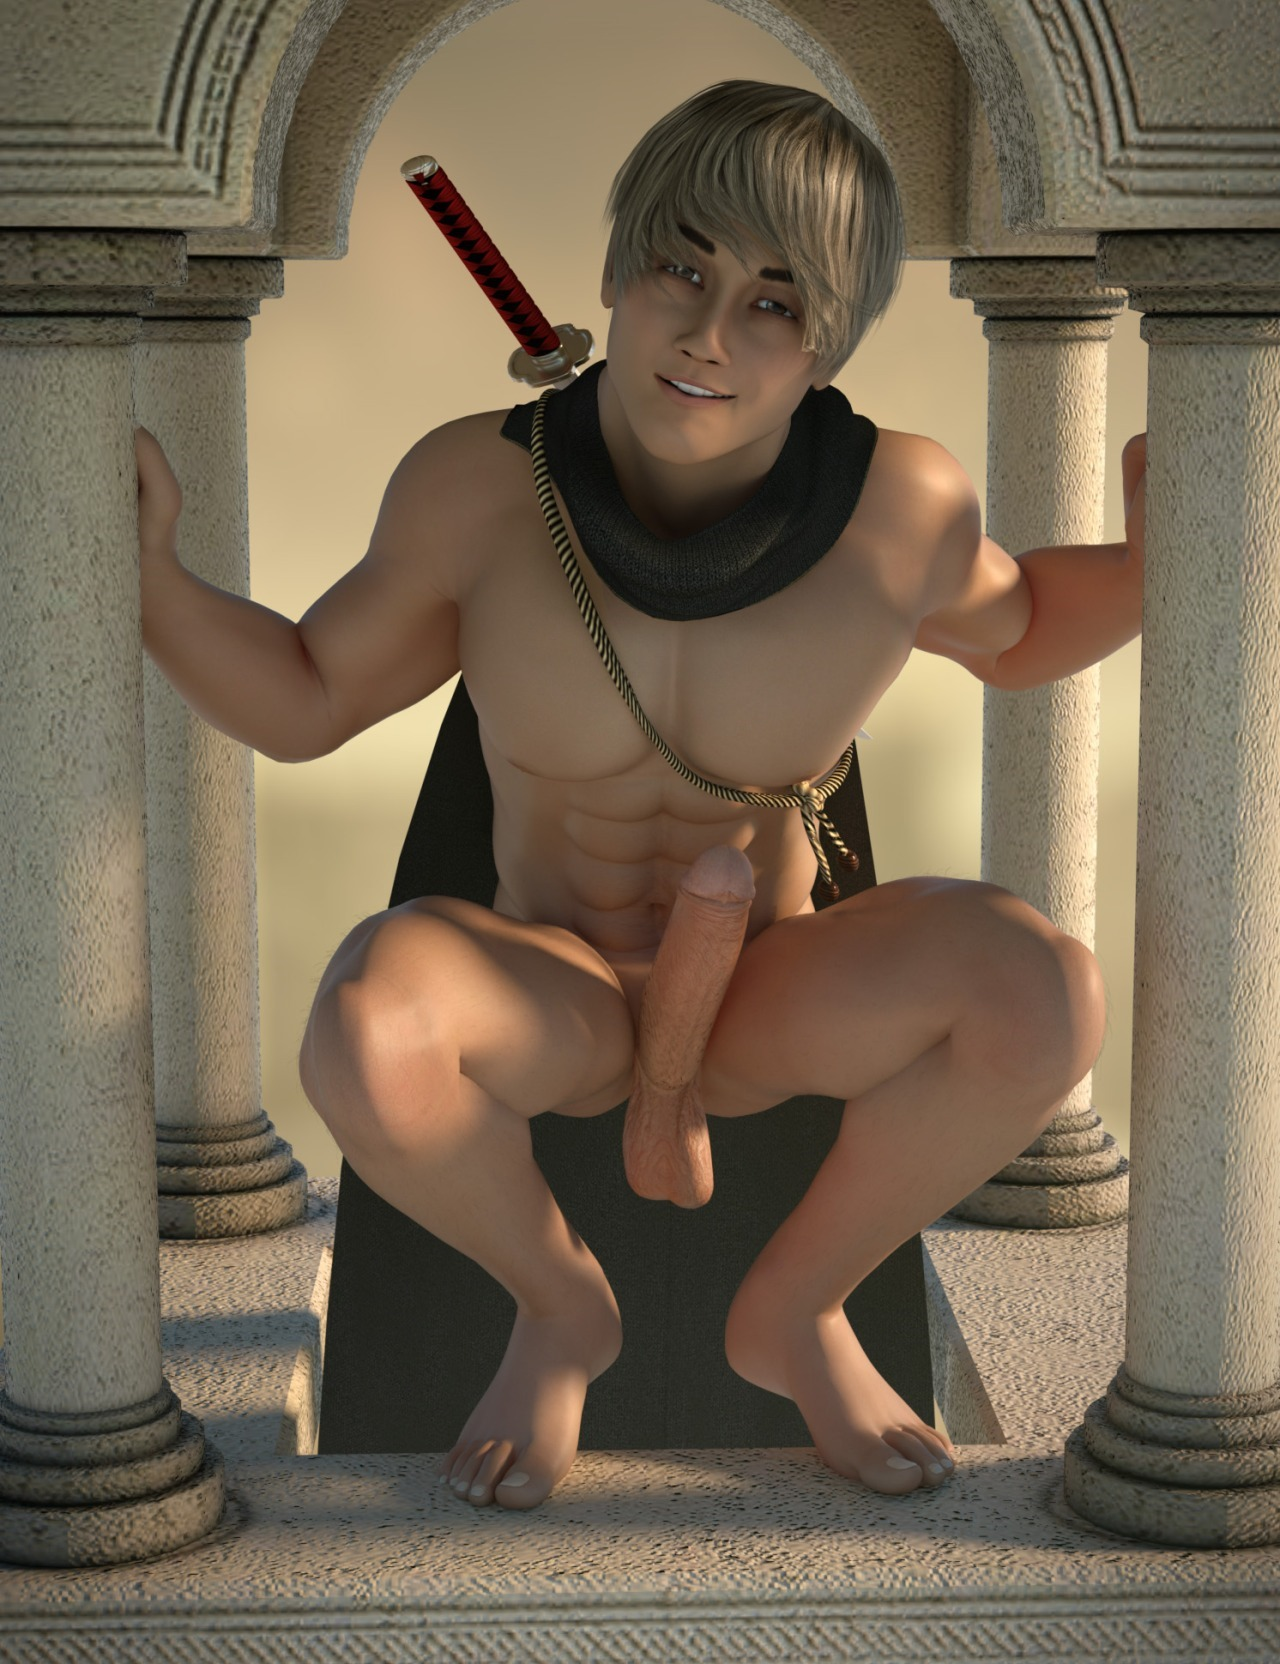 gay boy sex tumblr